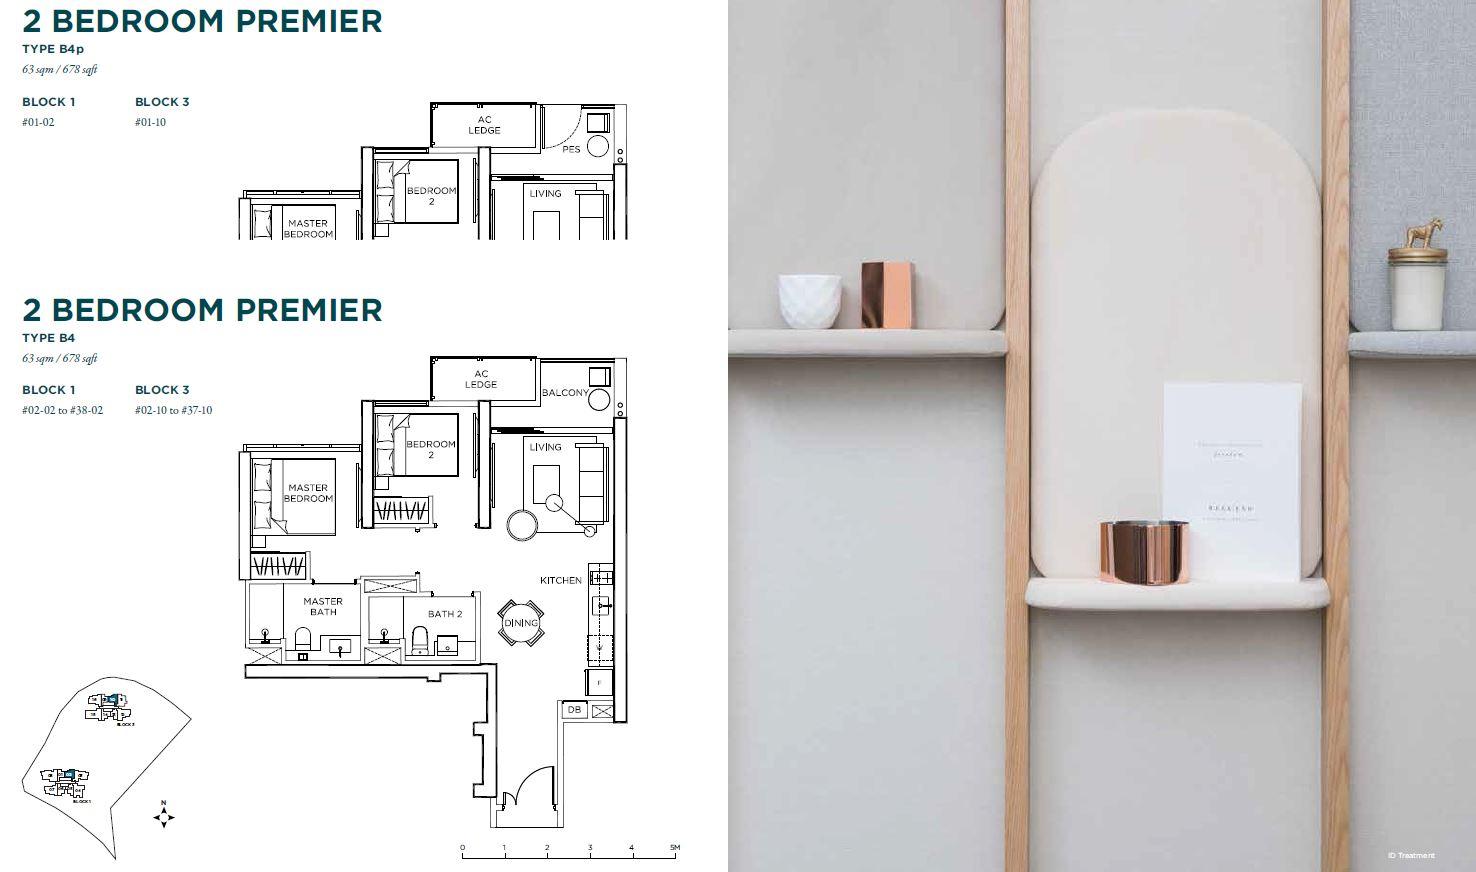 Gem Residences 2 bedroom premium